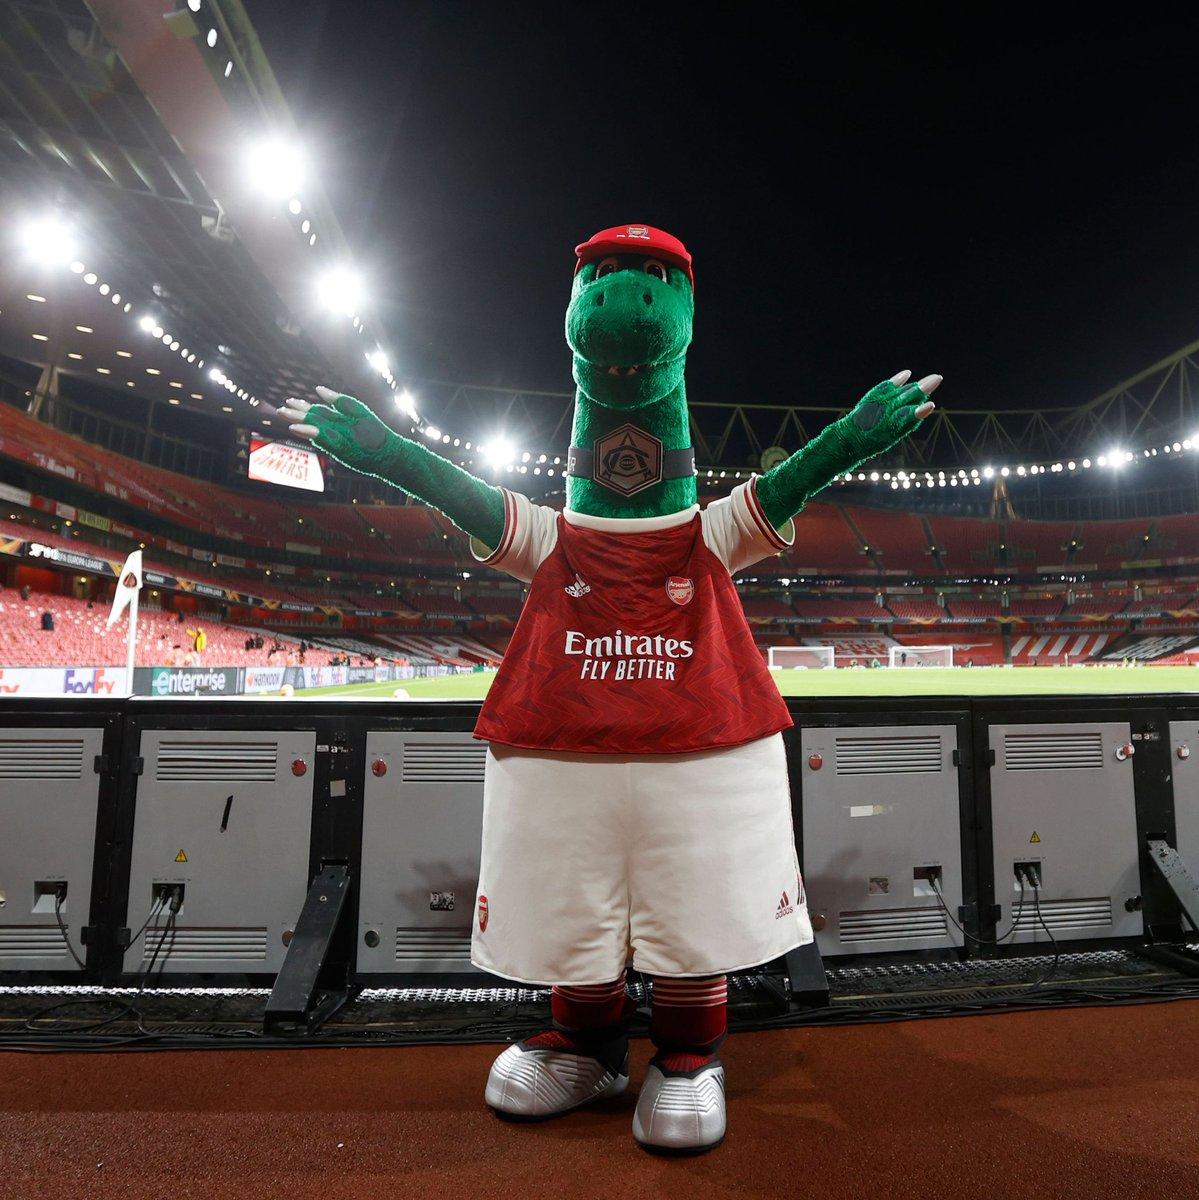 Return of fans and @Gunnersaurus to Emirates.  And  A Big Win.  Reasons to cheer up! 😀  #ARSRW #Gunners #YaGunnersYa #Arsenal #UEL